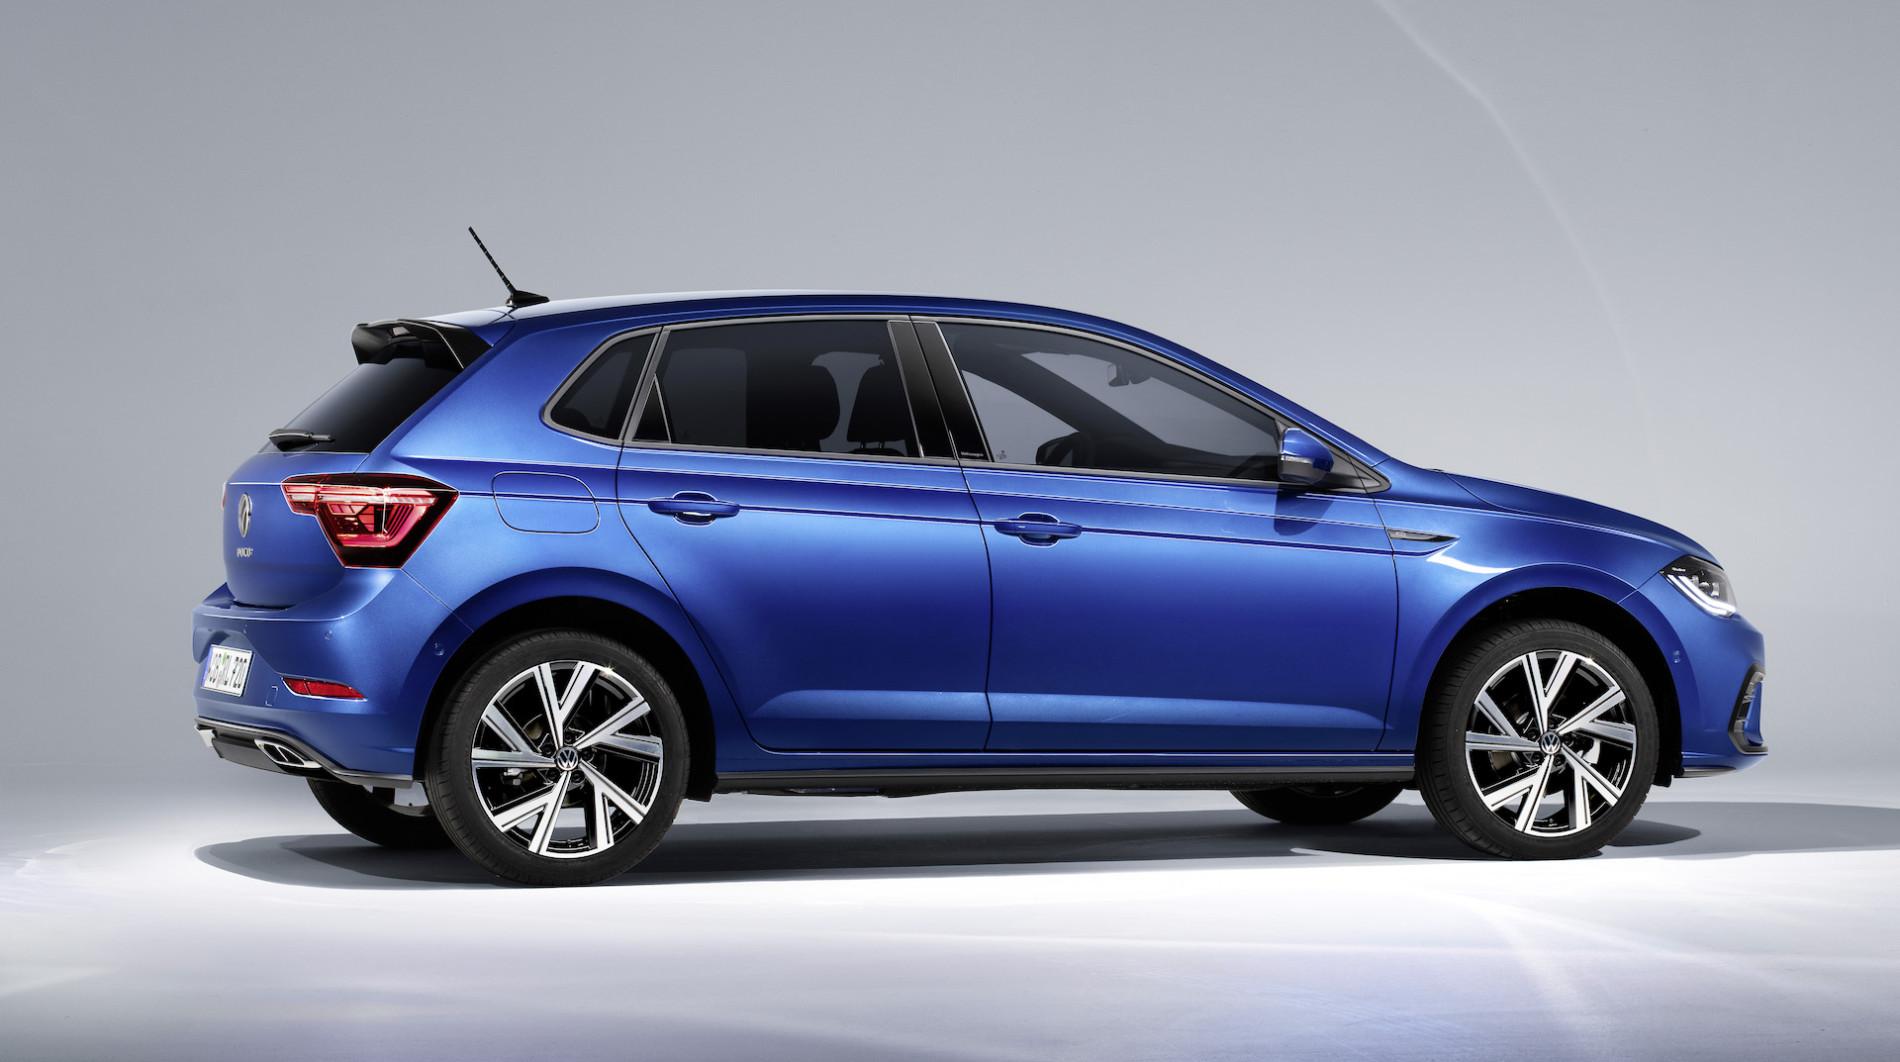 Volkswagen Polo Facelift - Volkswagen Polo Facelift